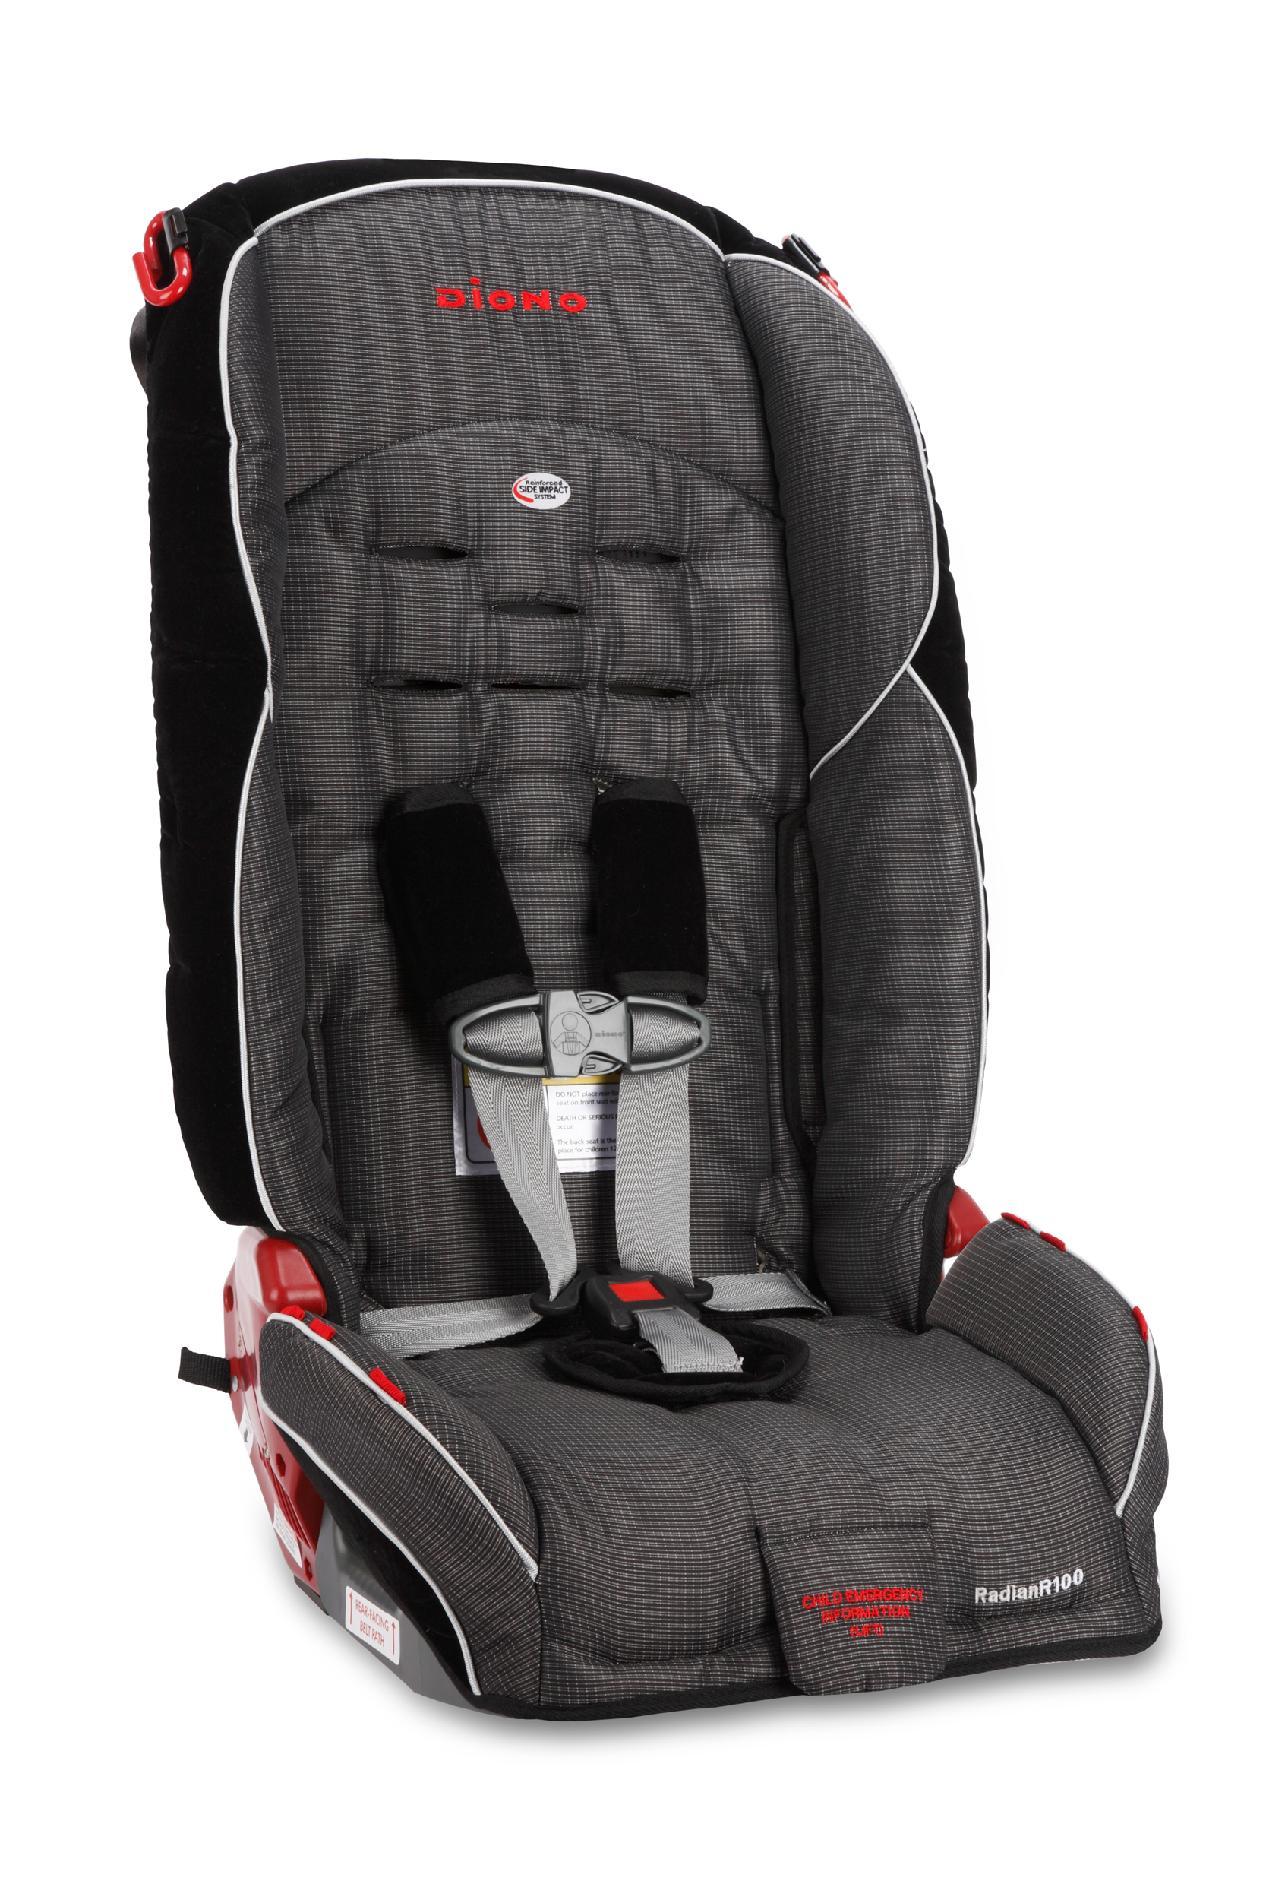 DIONO, LLC Radian R100 Convertible Car Seat - Shadow